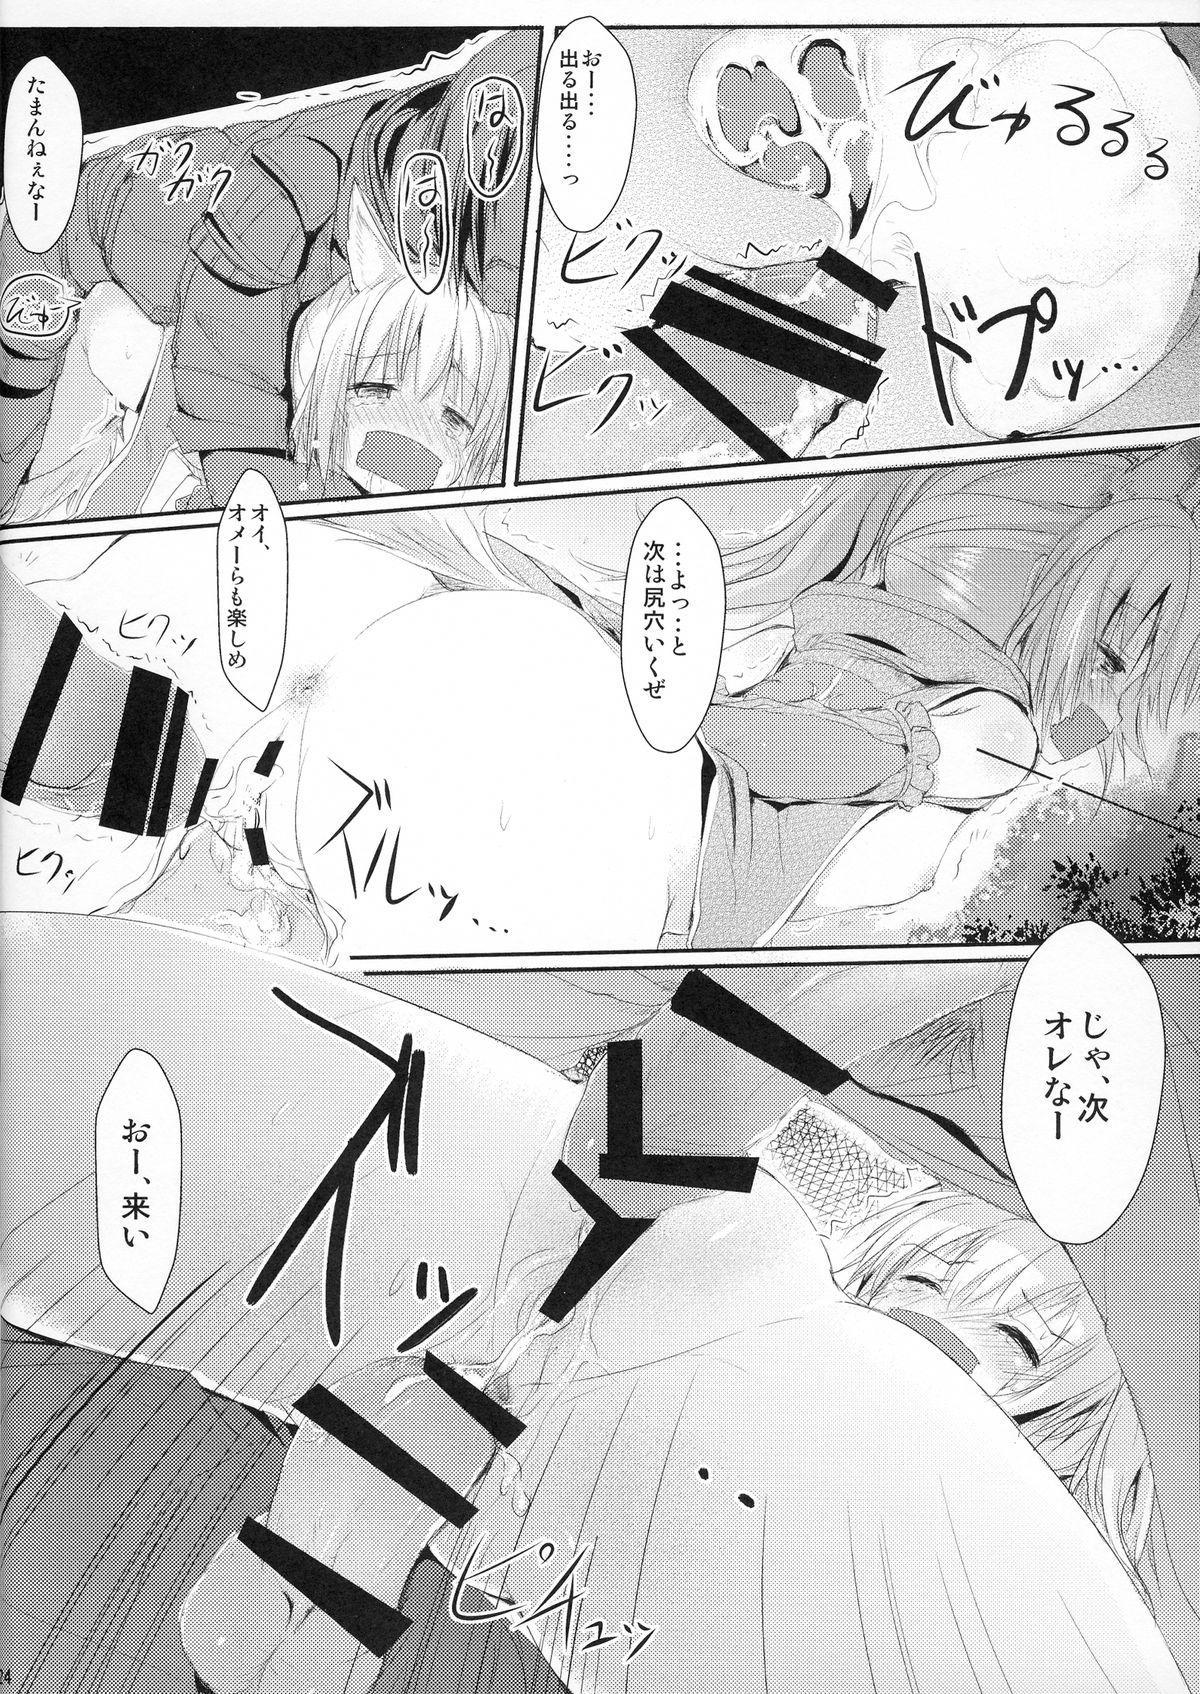 [Mirukomi (PRIMIL)] Human wa Erin-chan ni Hidoi Koto Shitai yo ne - ELIN's the best - (TERA The Exiled Realm of Arborea) 23